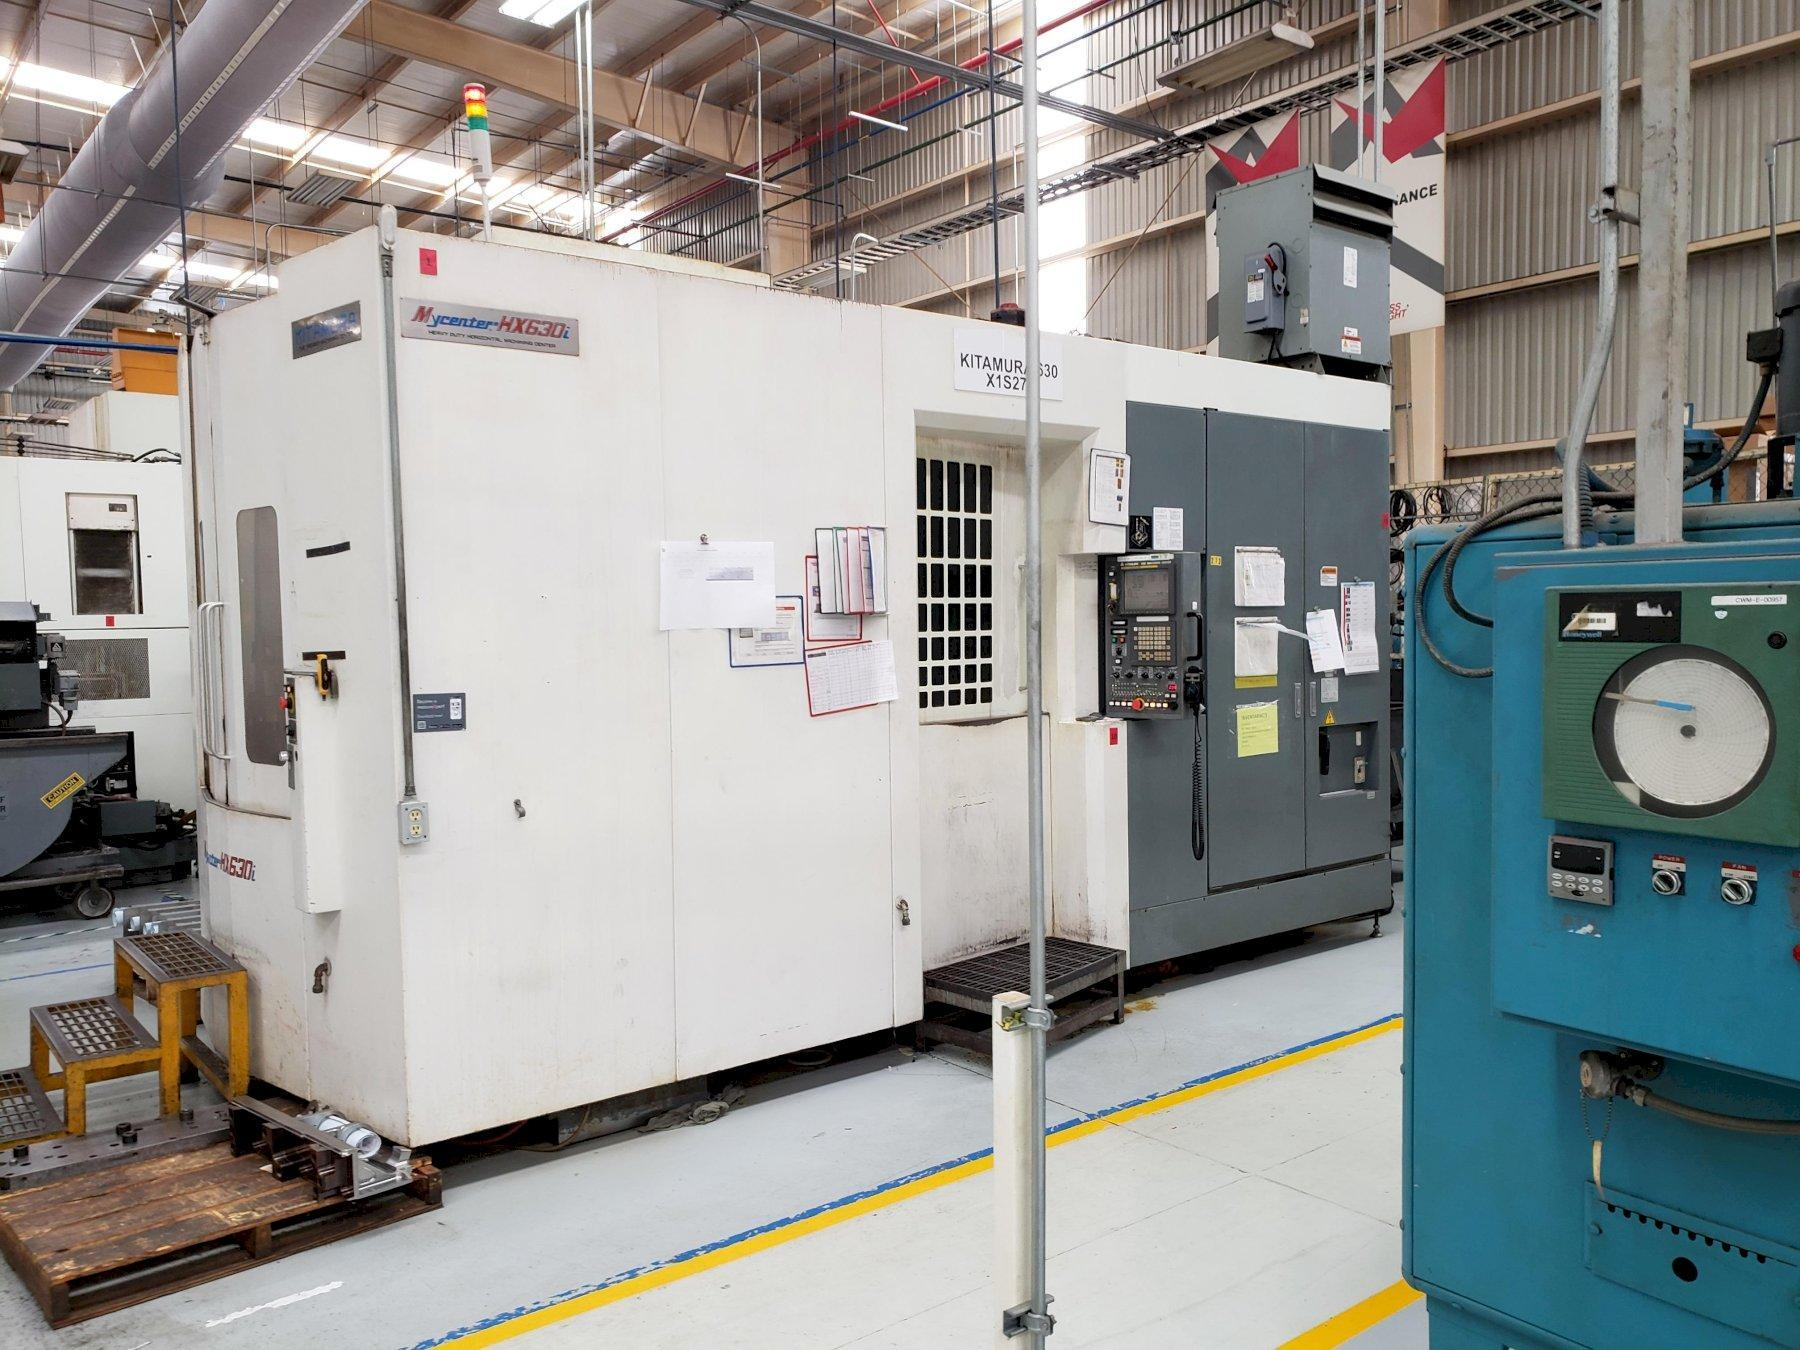 Kitamura HX630i TGA CNC Horizontal Machining Center